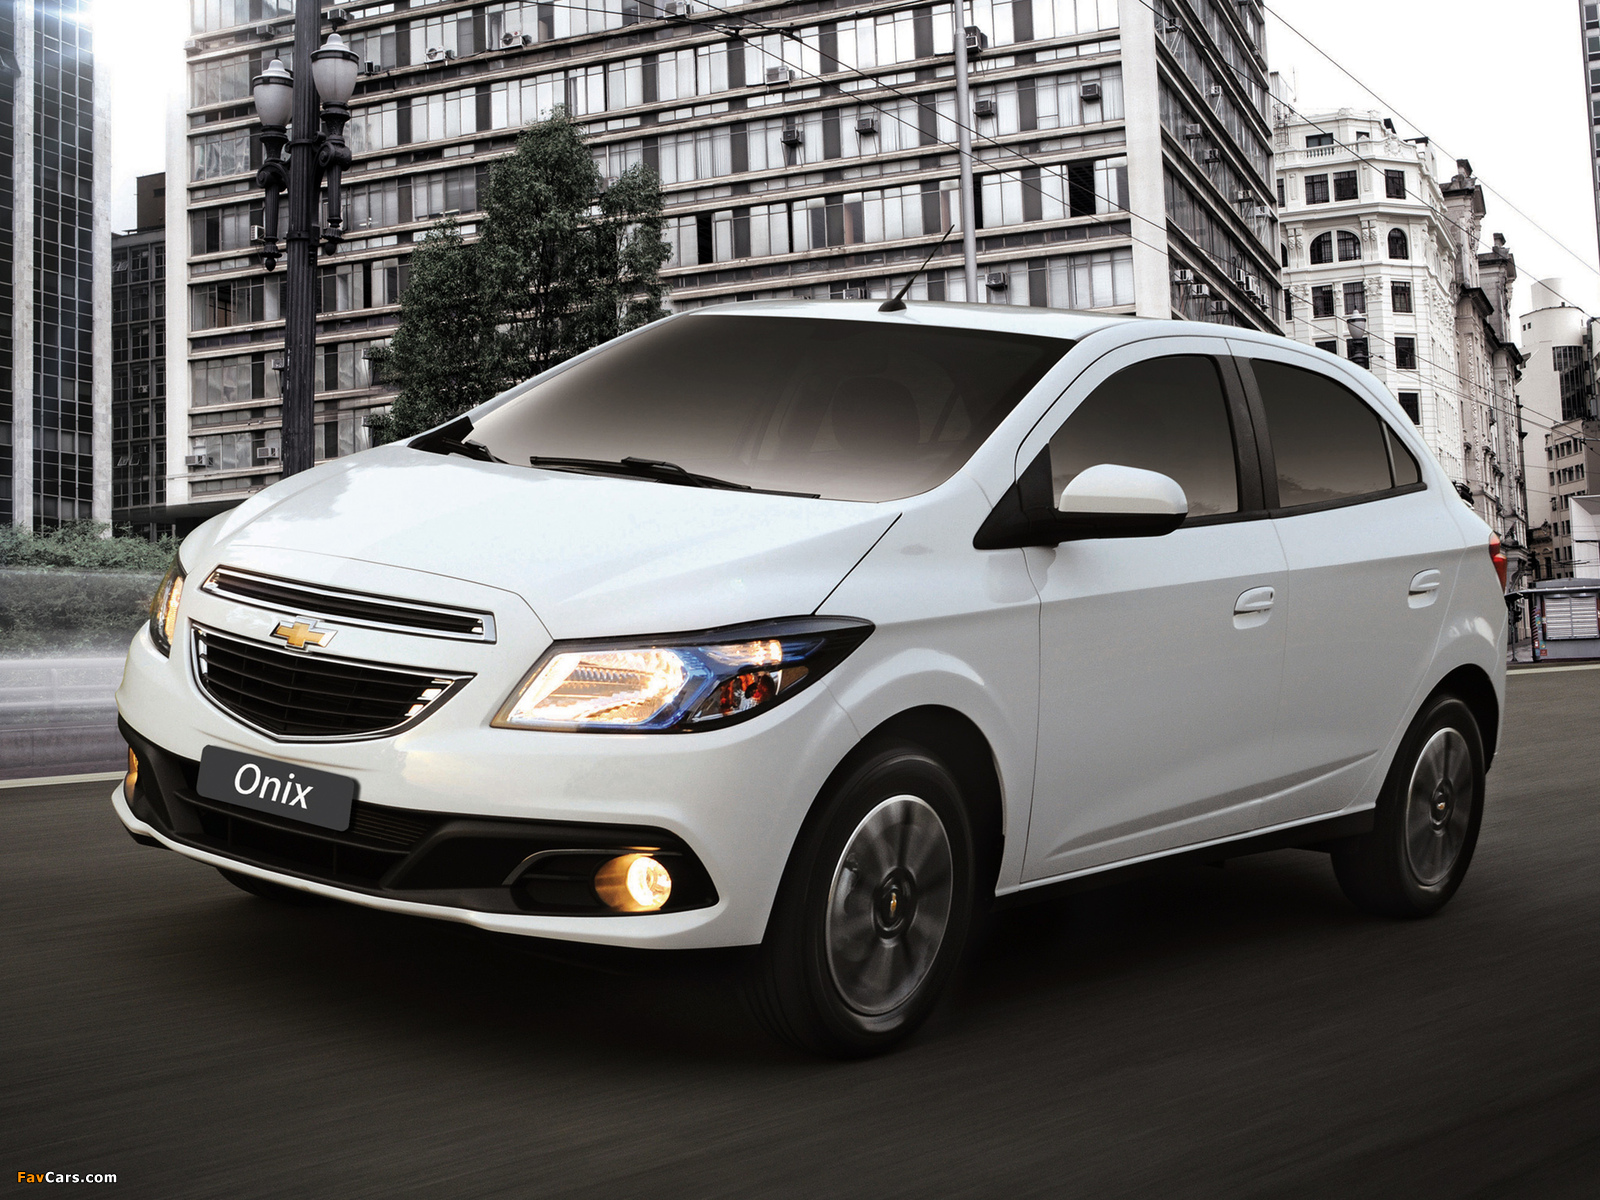 Chevrolet Onix 2012 pictures (1600 x 1200)